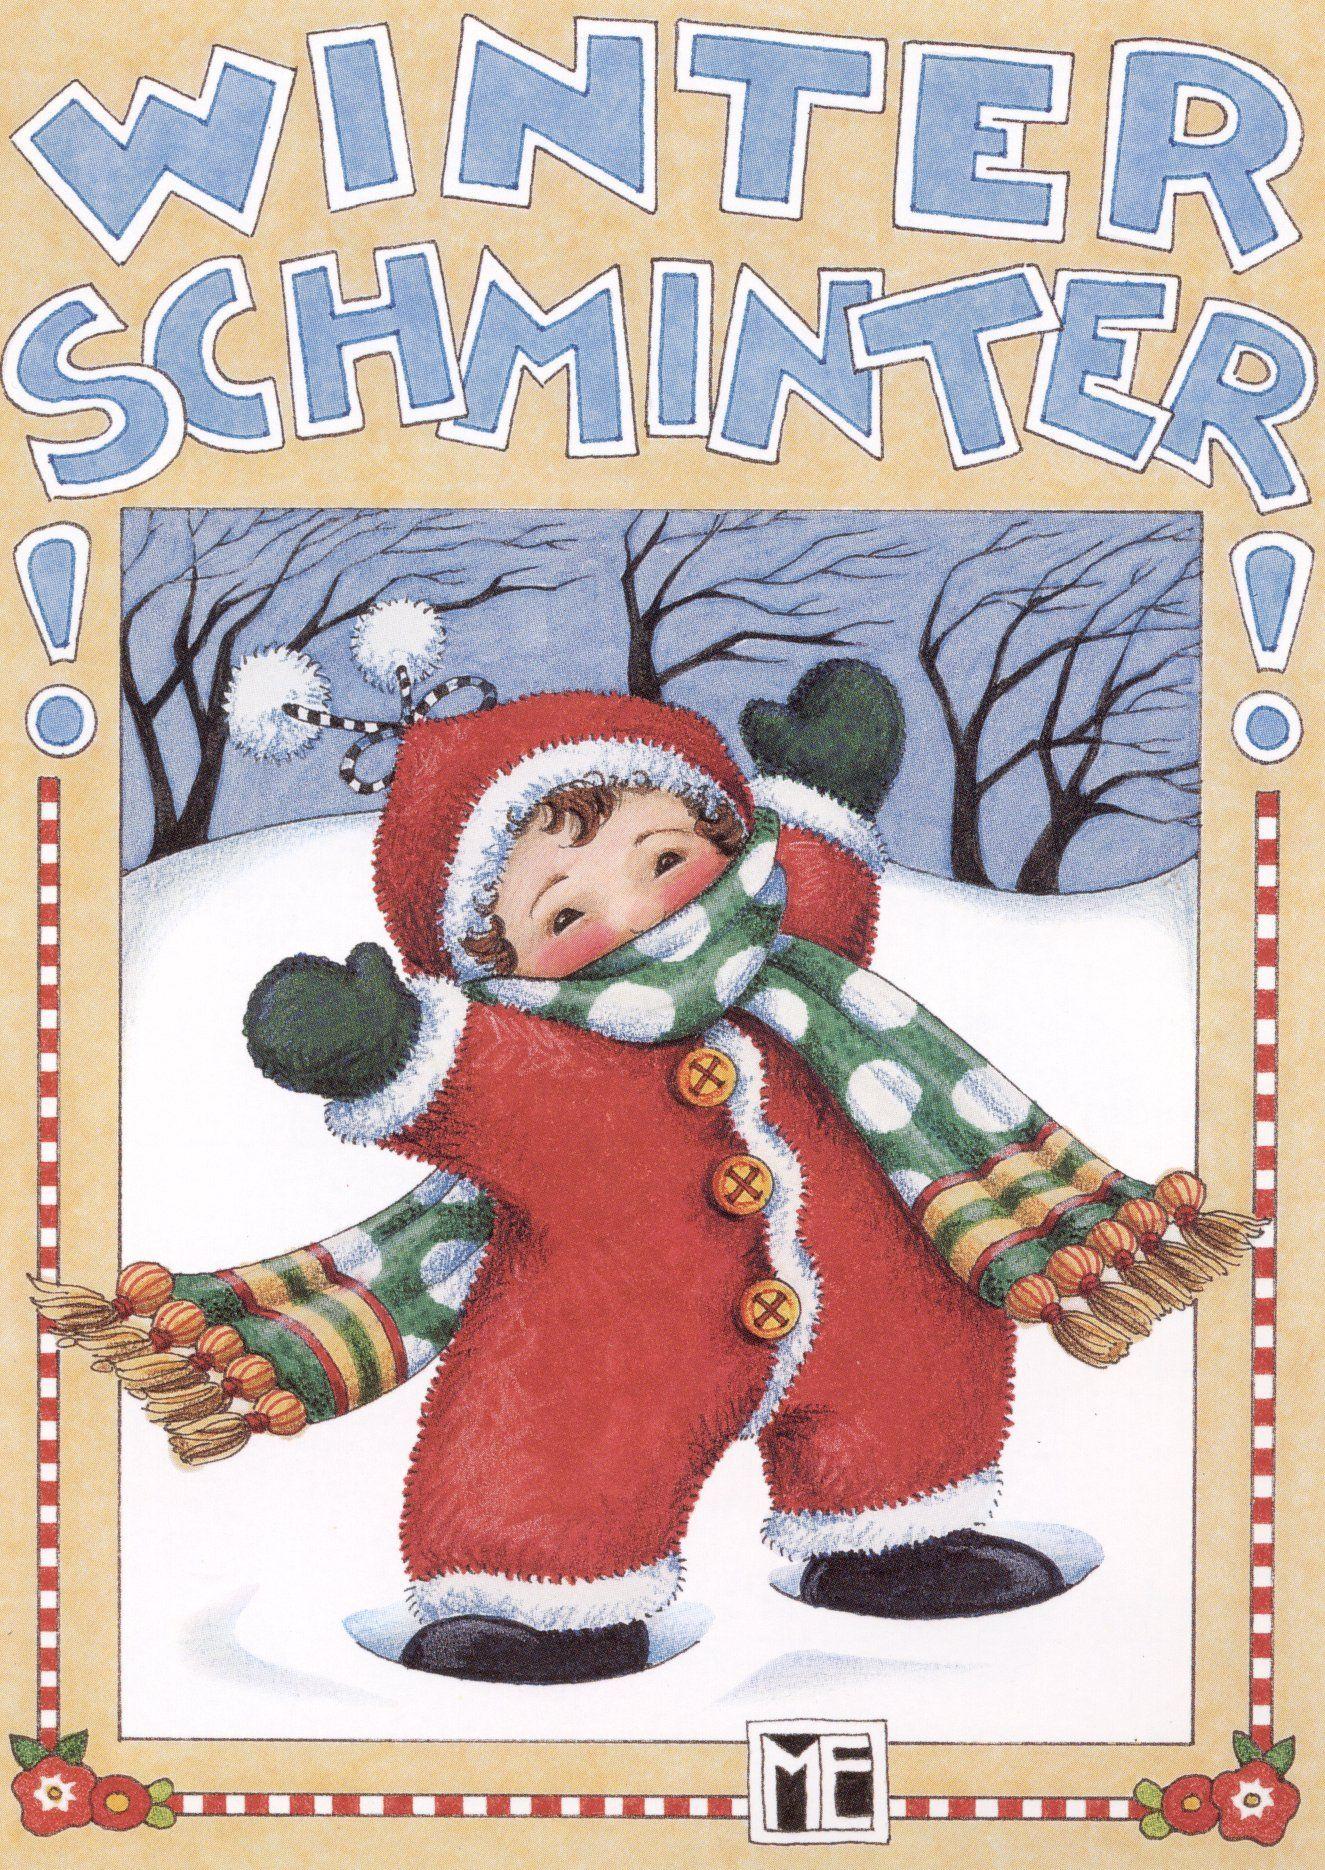 6 Cards /& Envelopes New Mary Engelbreit Christmas Notecards Winter Schminter